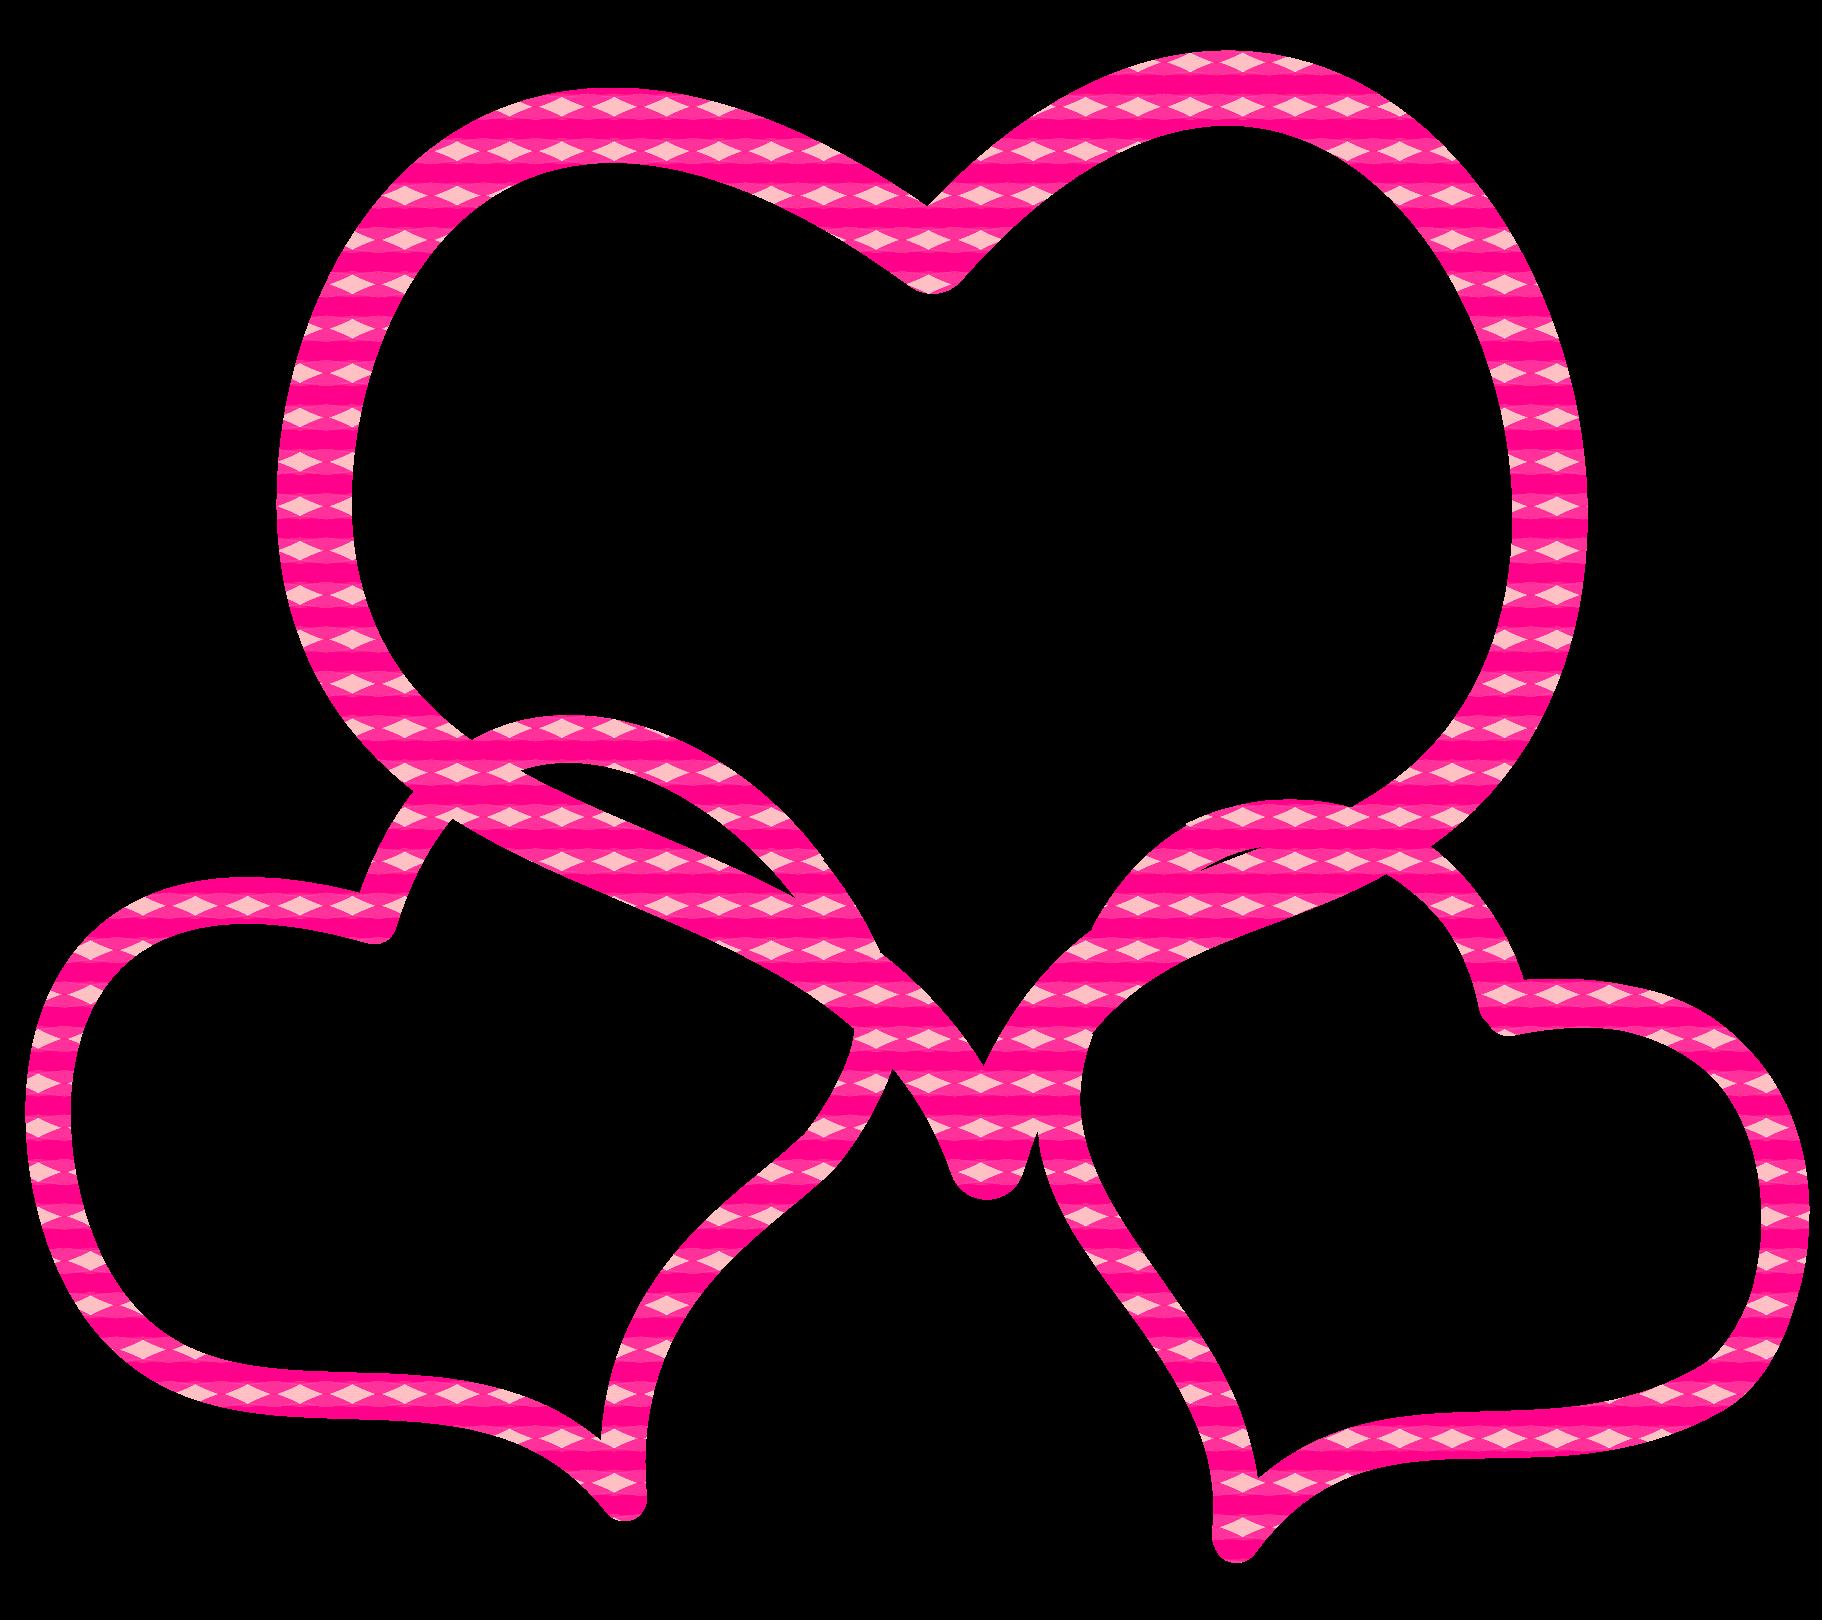 All free transparent png. Clipart hearts scrapbook